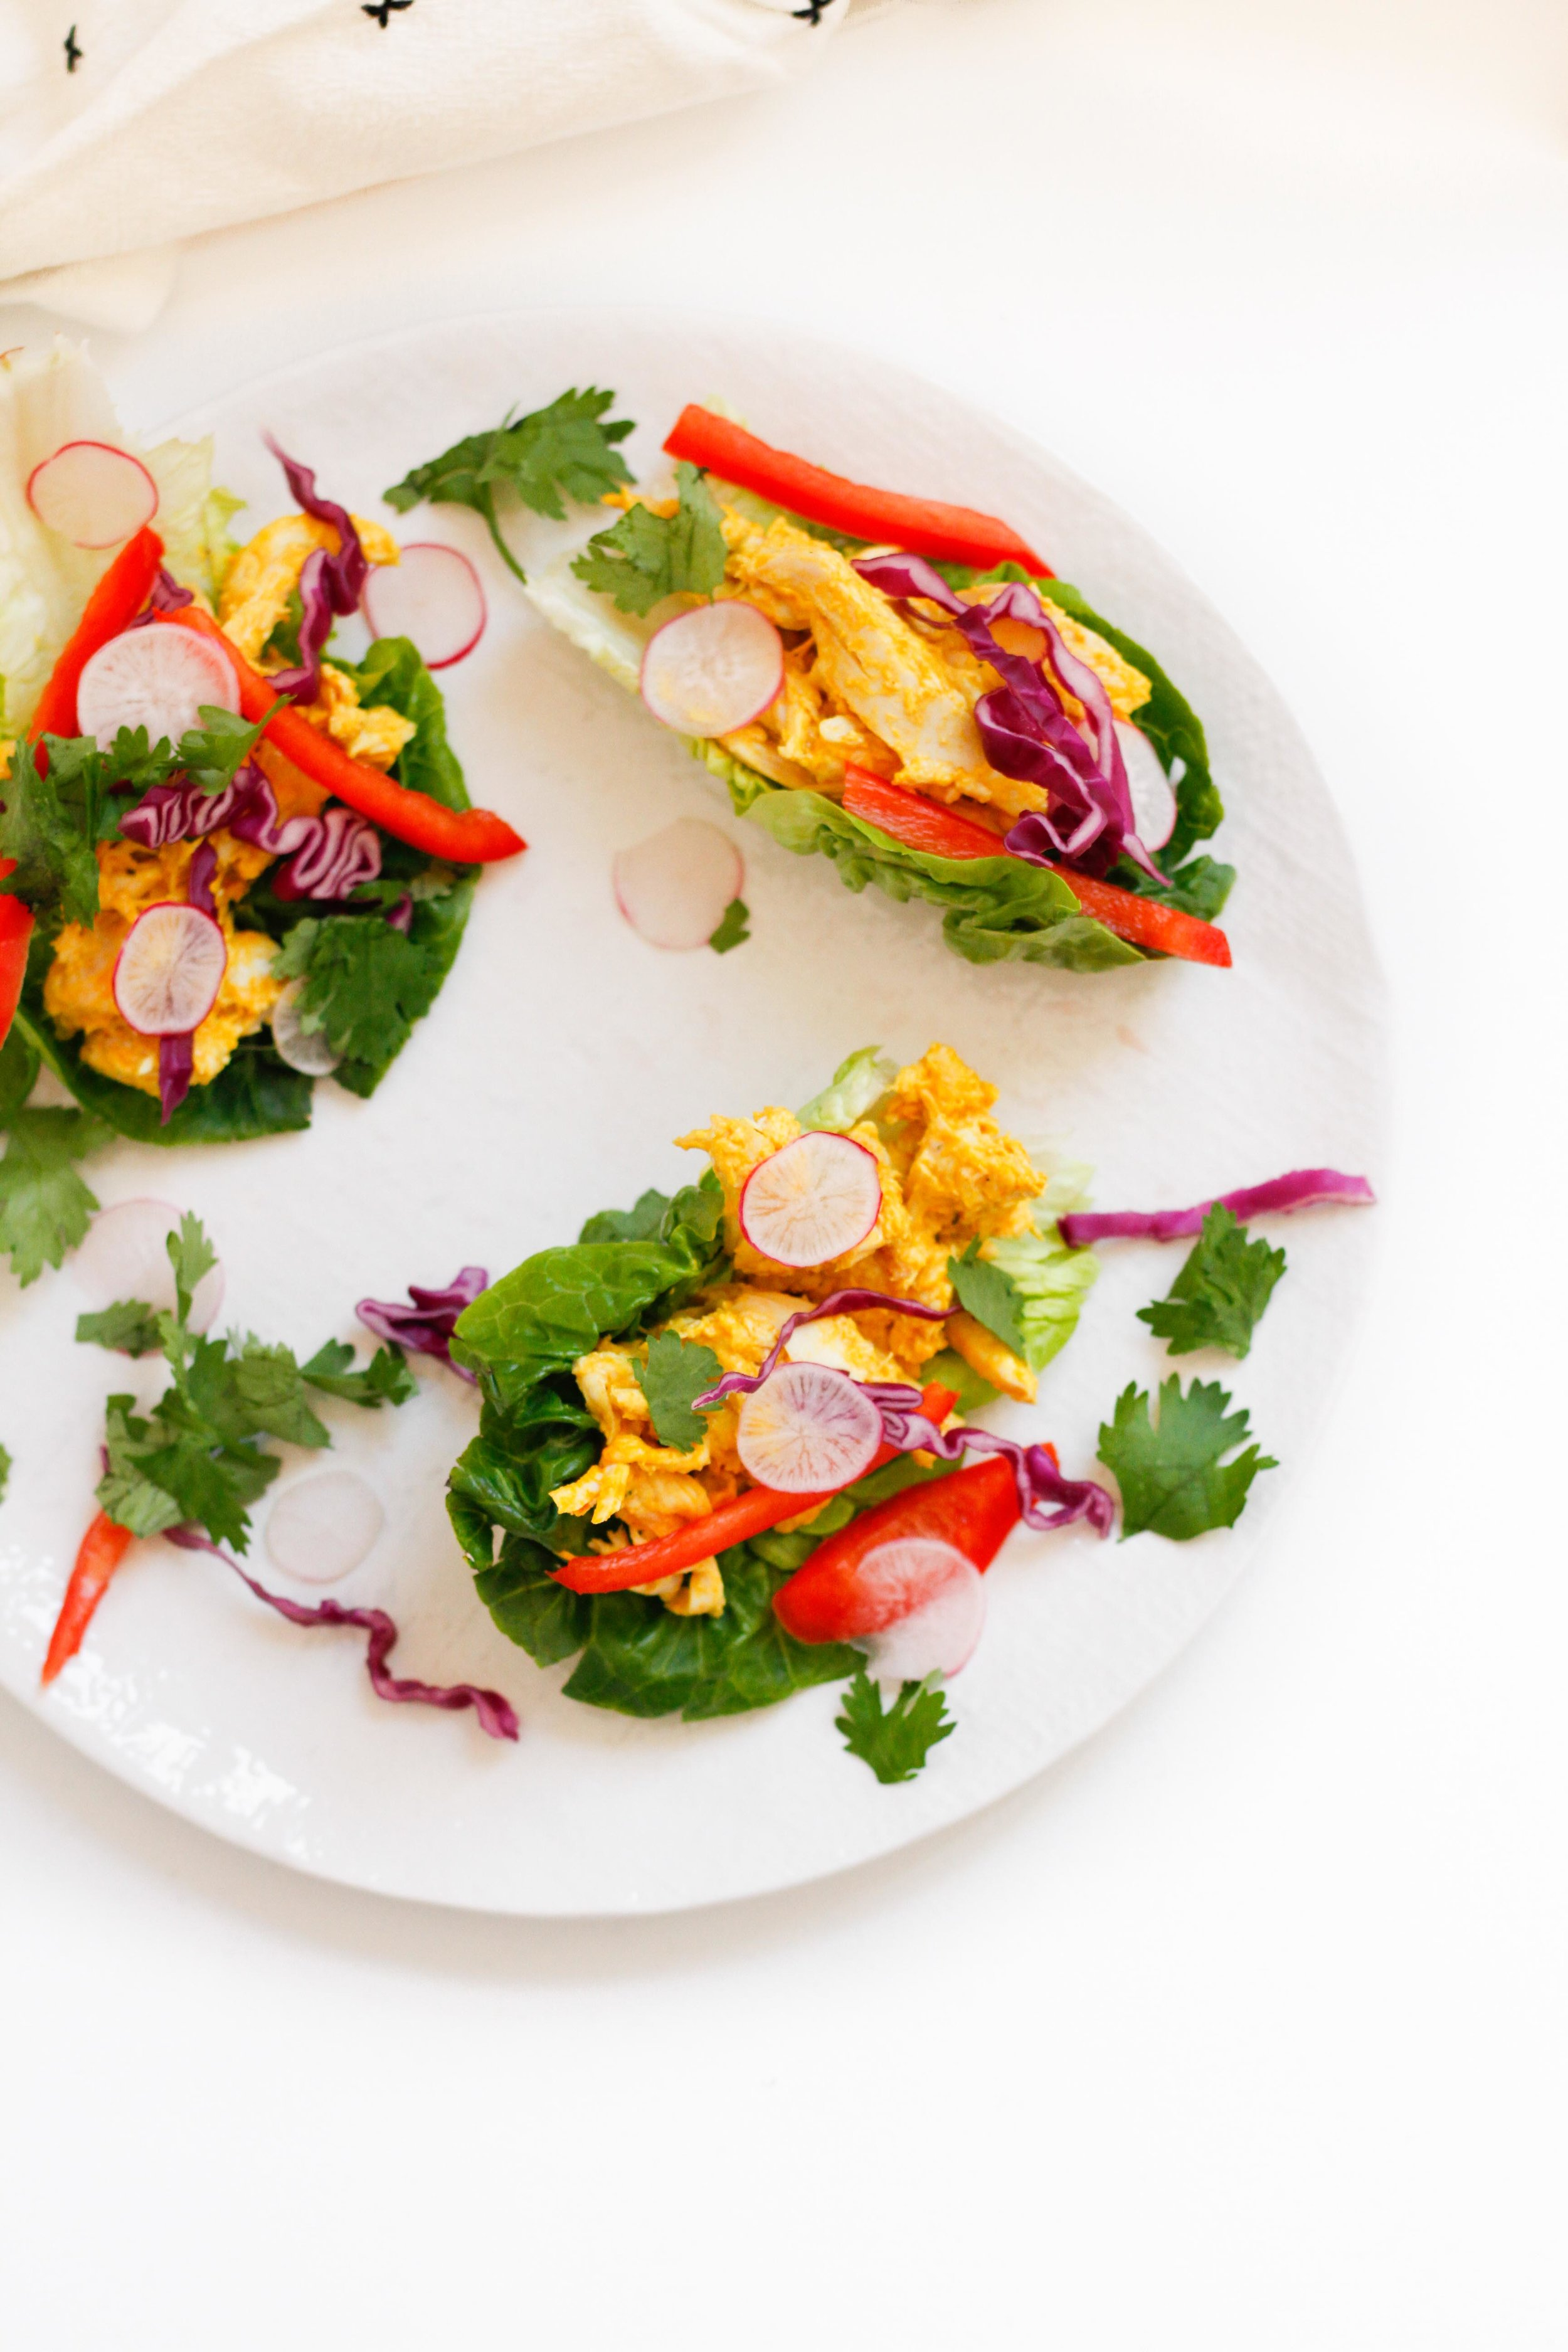 No-cook chicken salad wraps